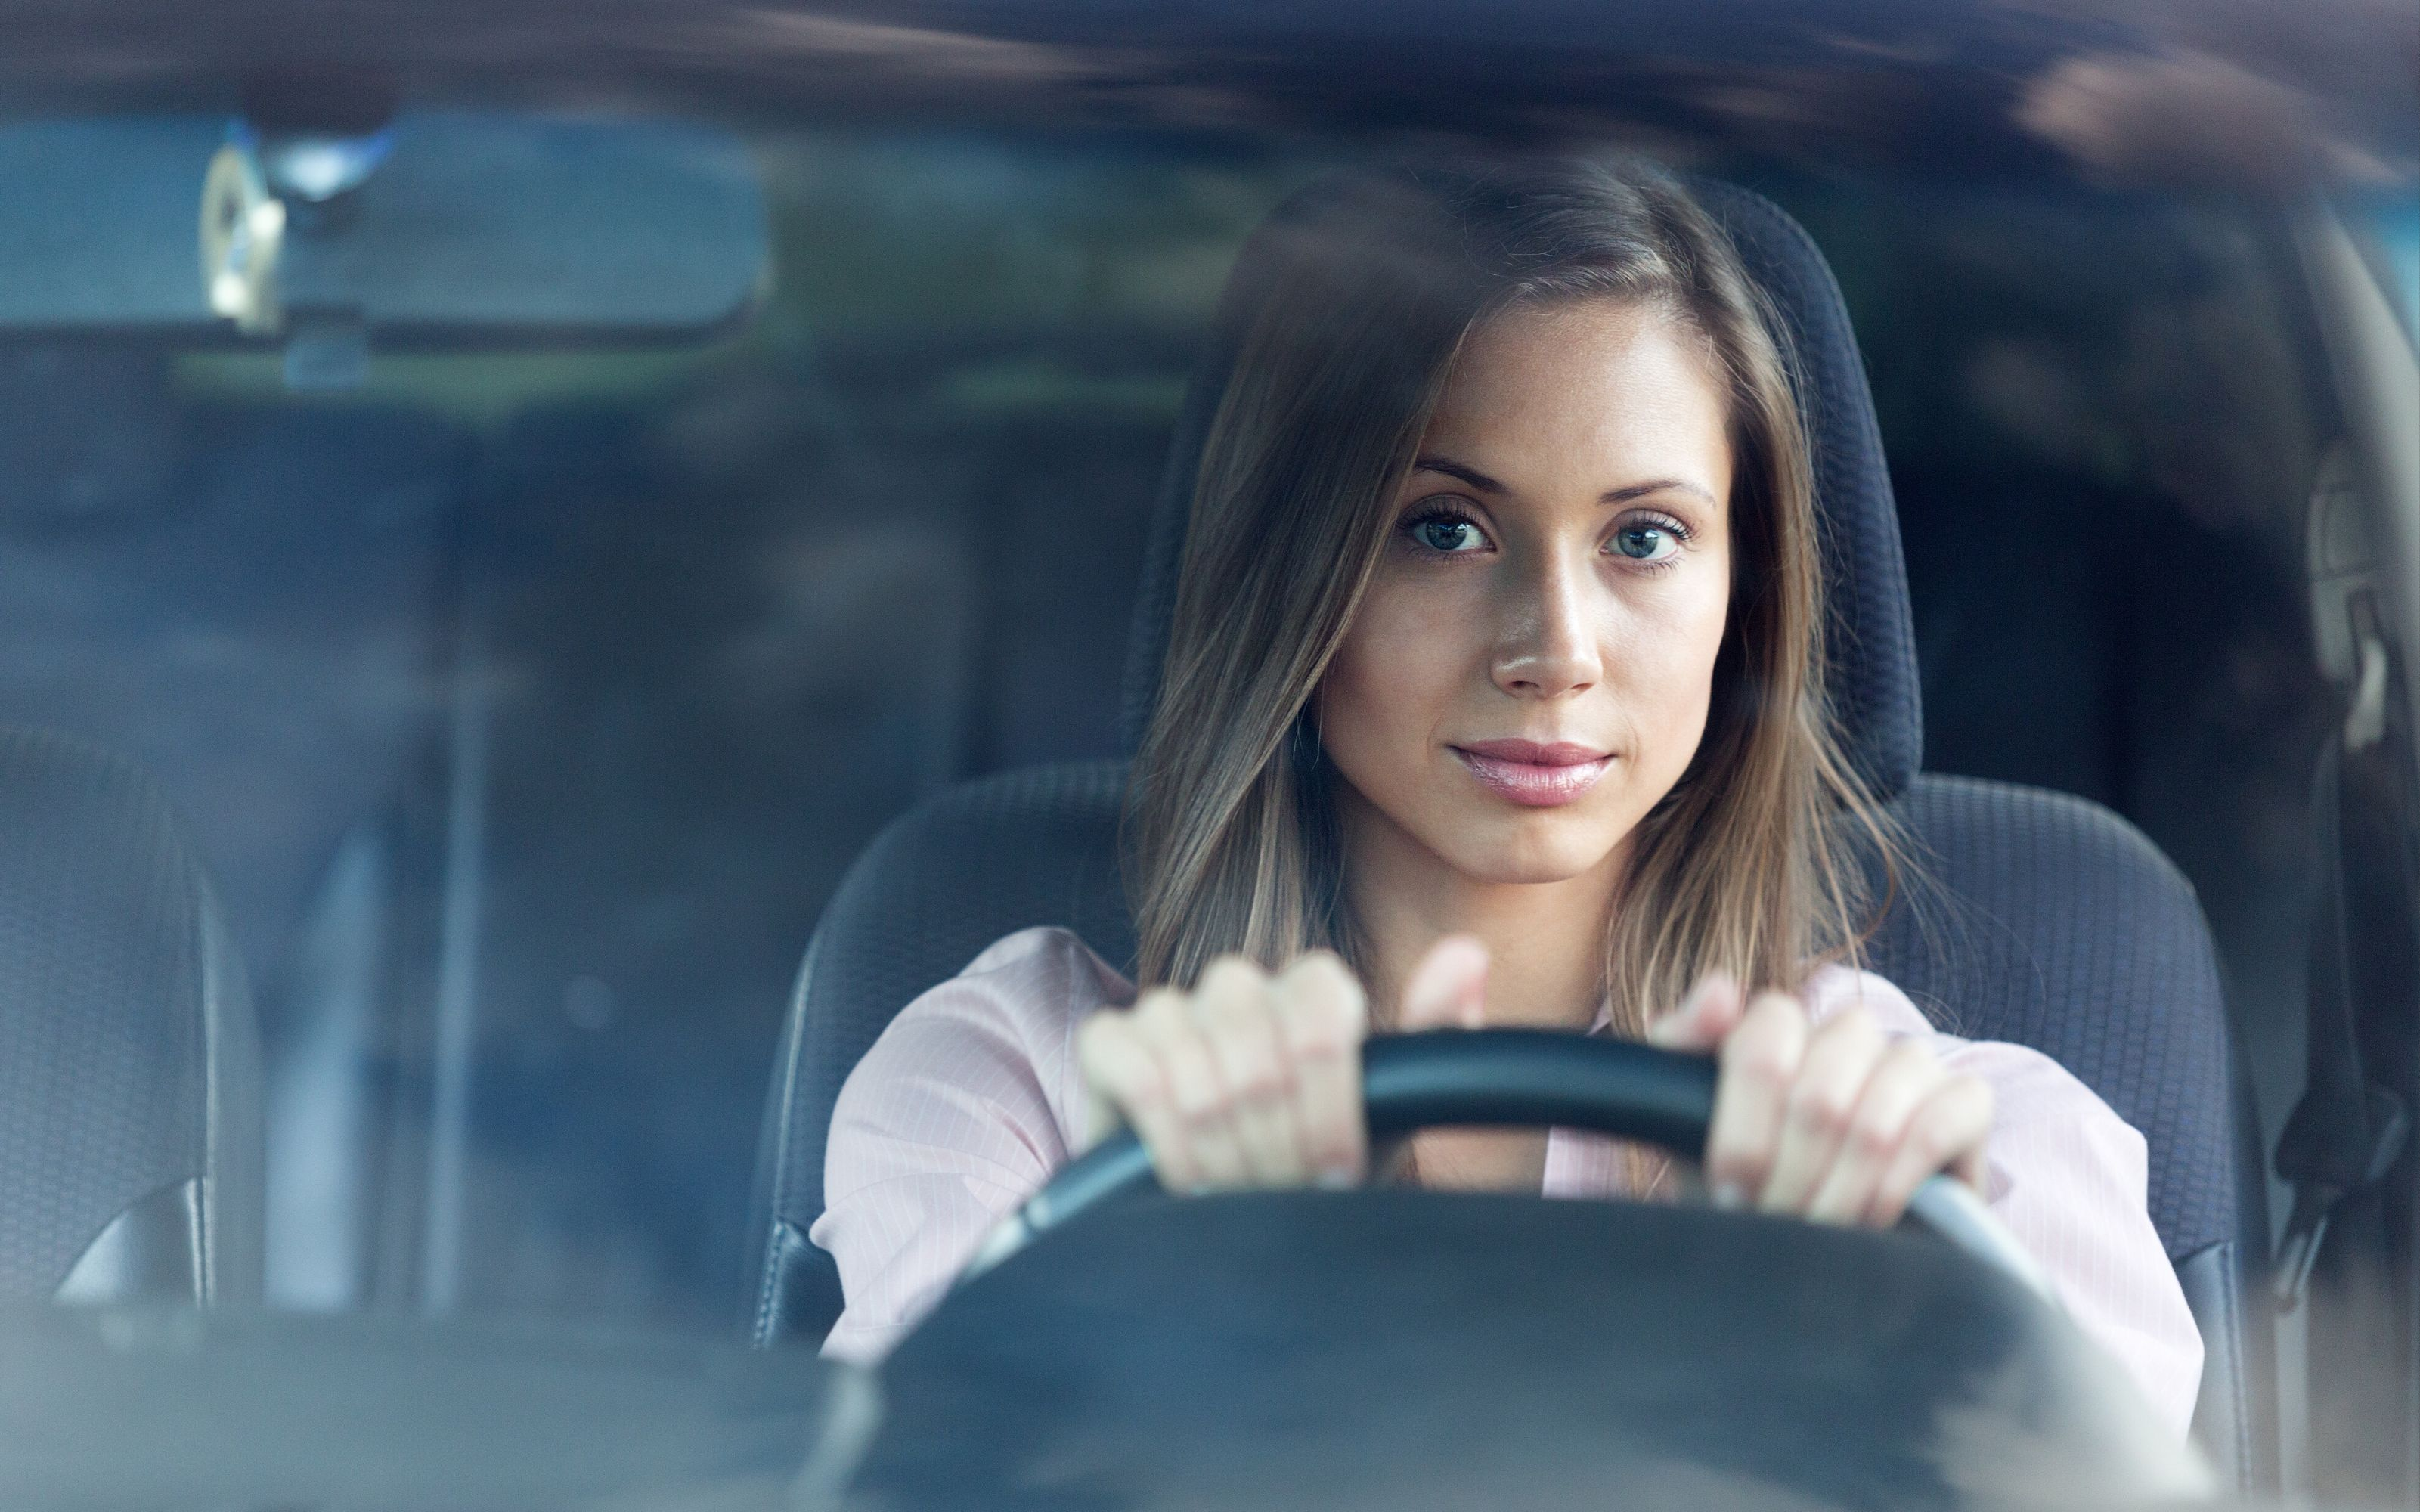 Perte permis de conduire / duplicata